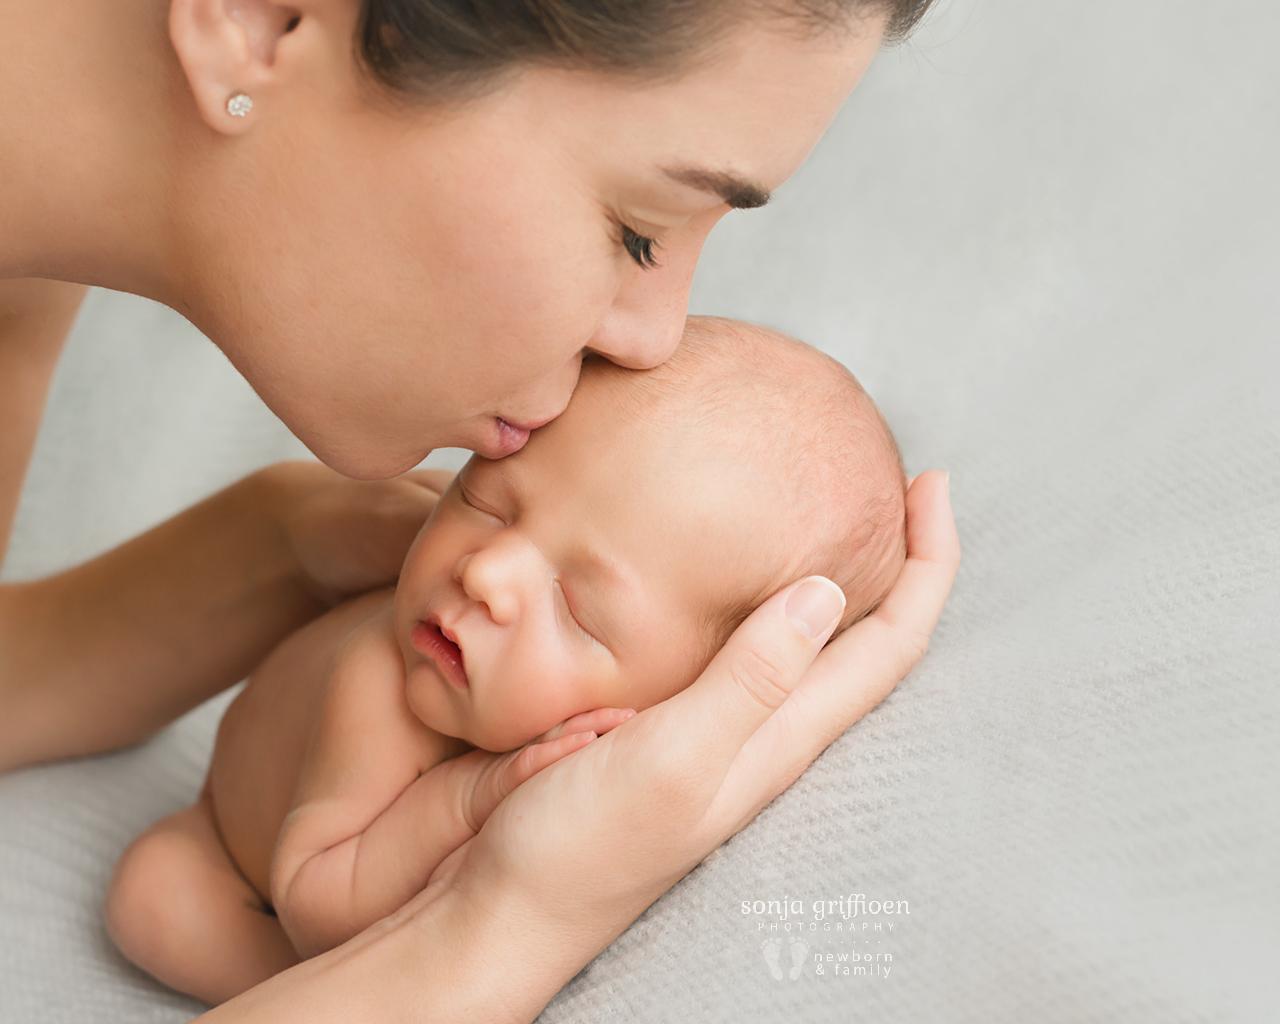 Cooper-Newborn-Brisbane-Newborn-Photographer-Sonja-Griffioen-071.jpg